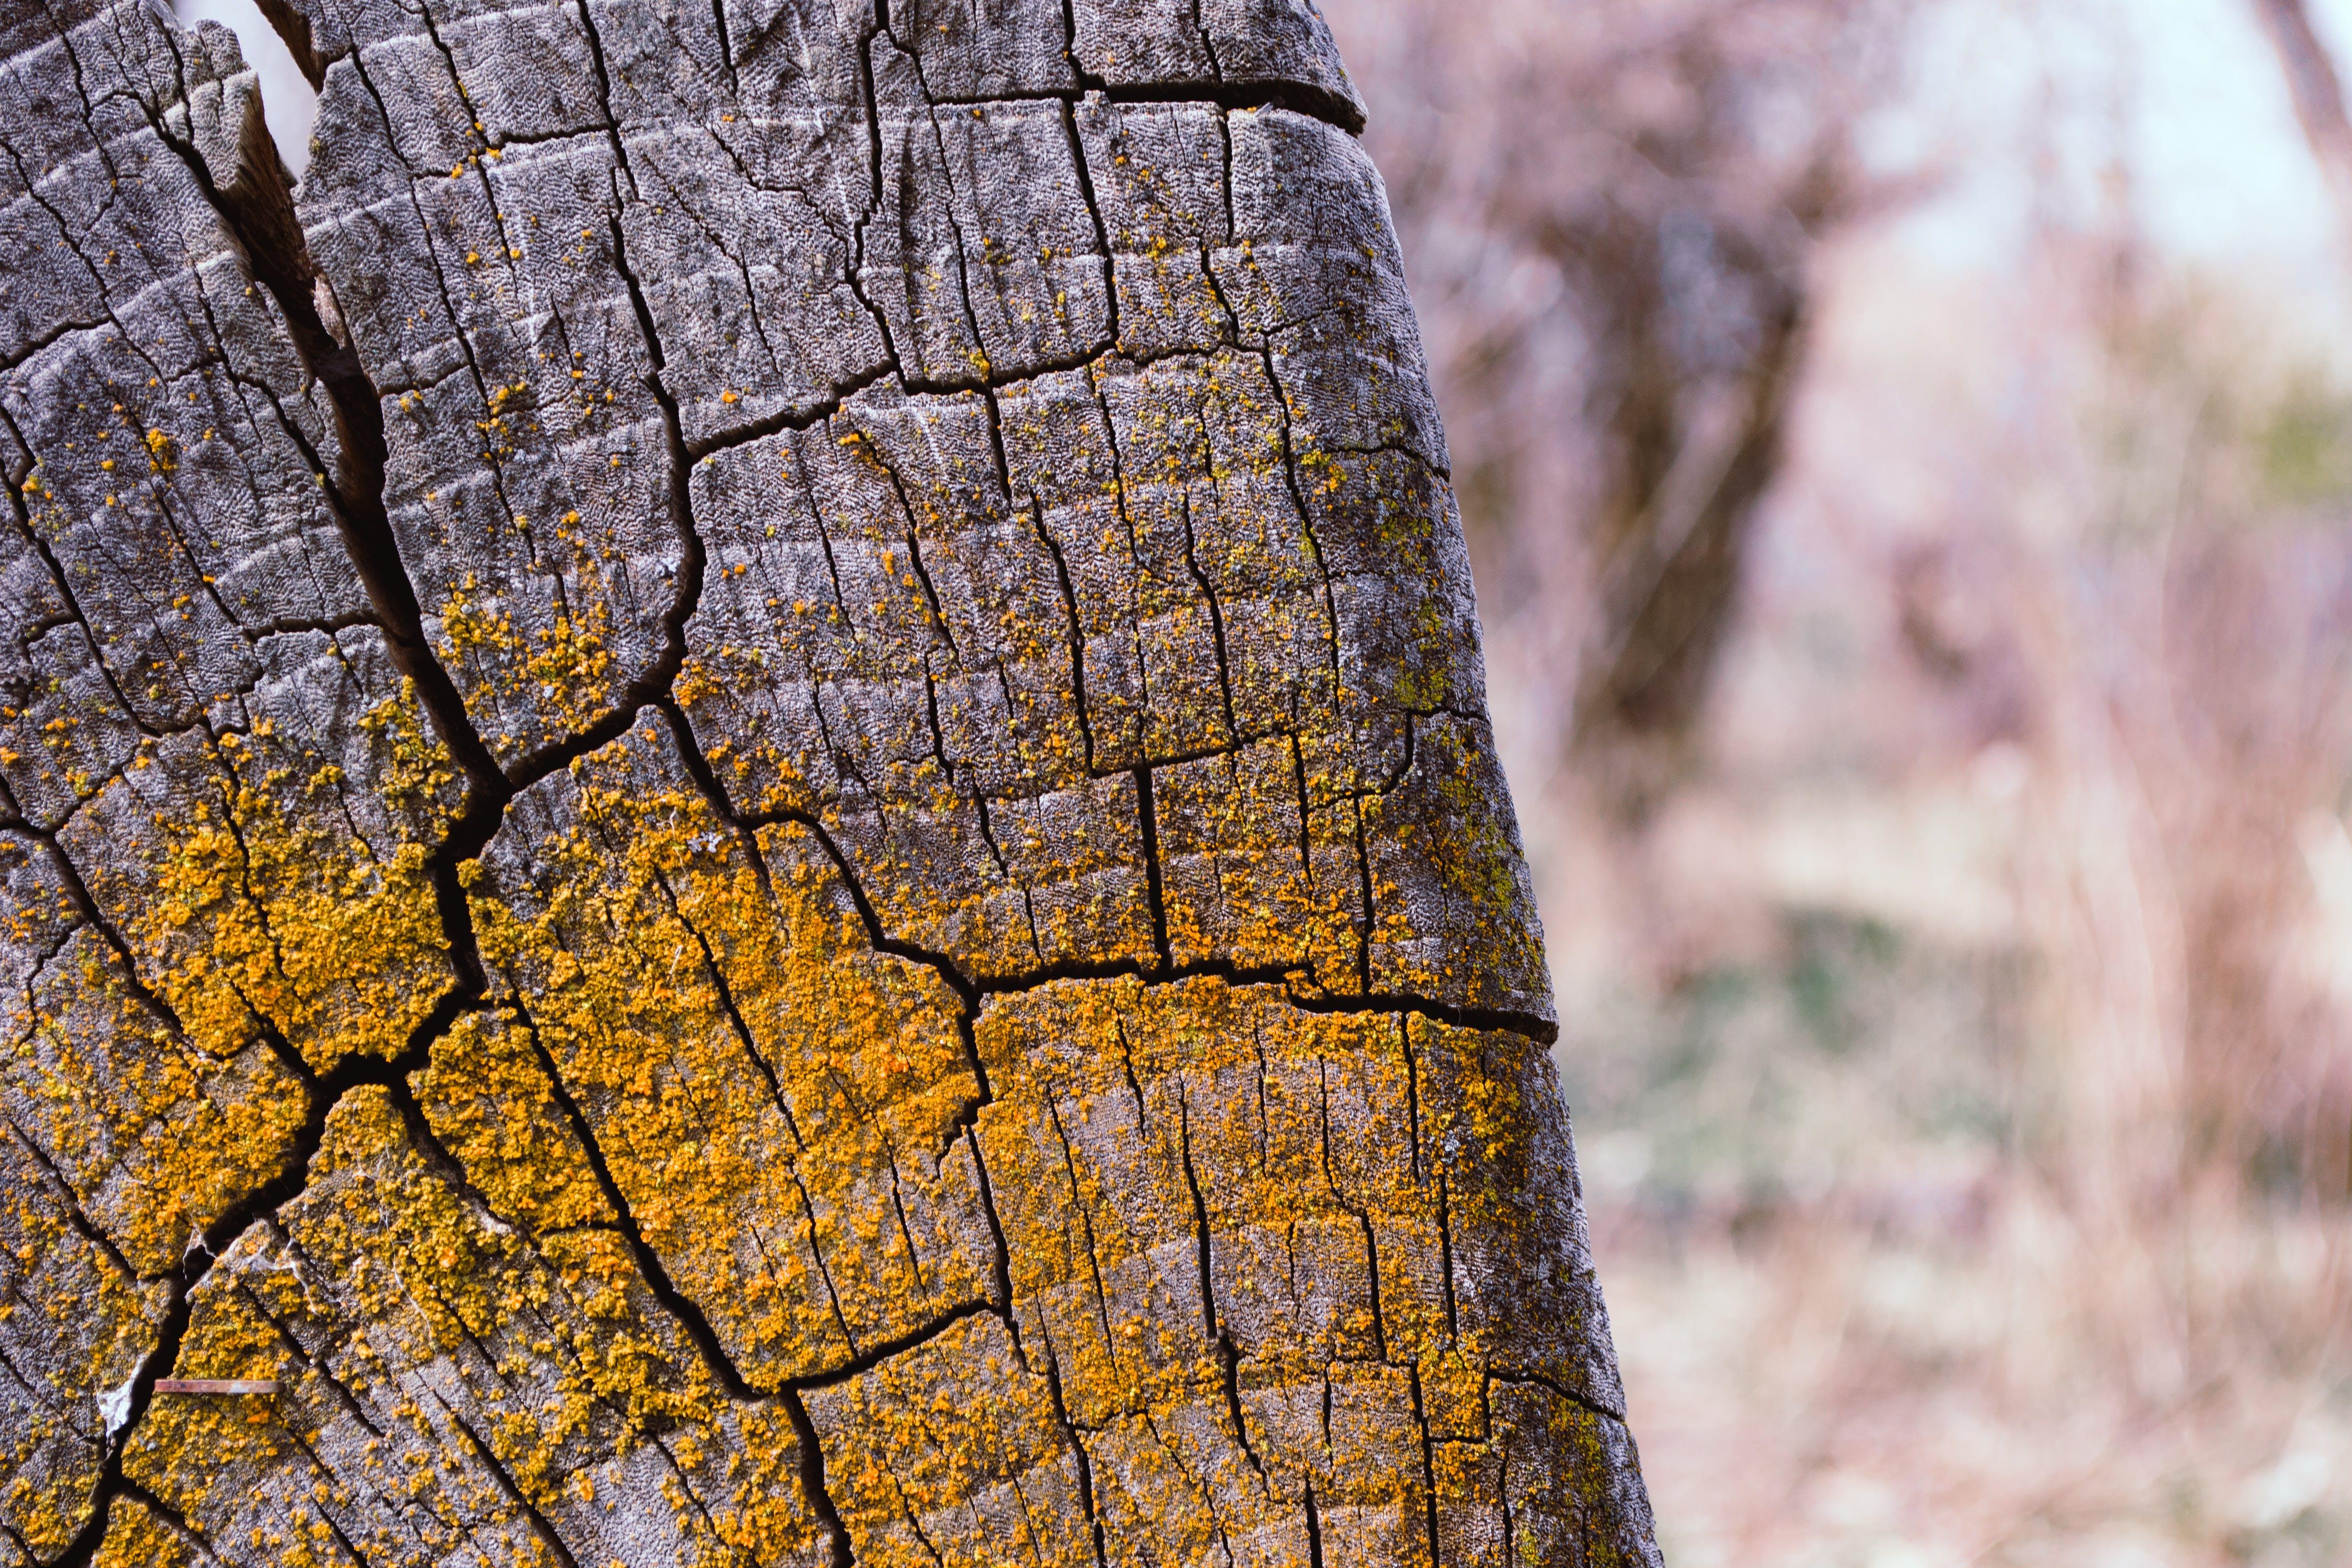 Gray Tree Stump With Yellow Moss